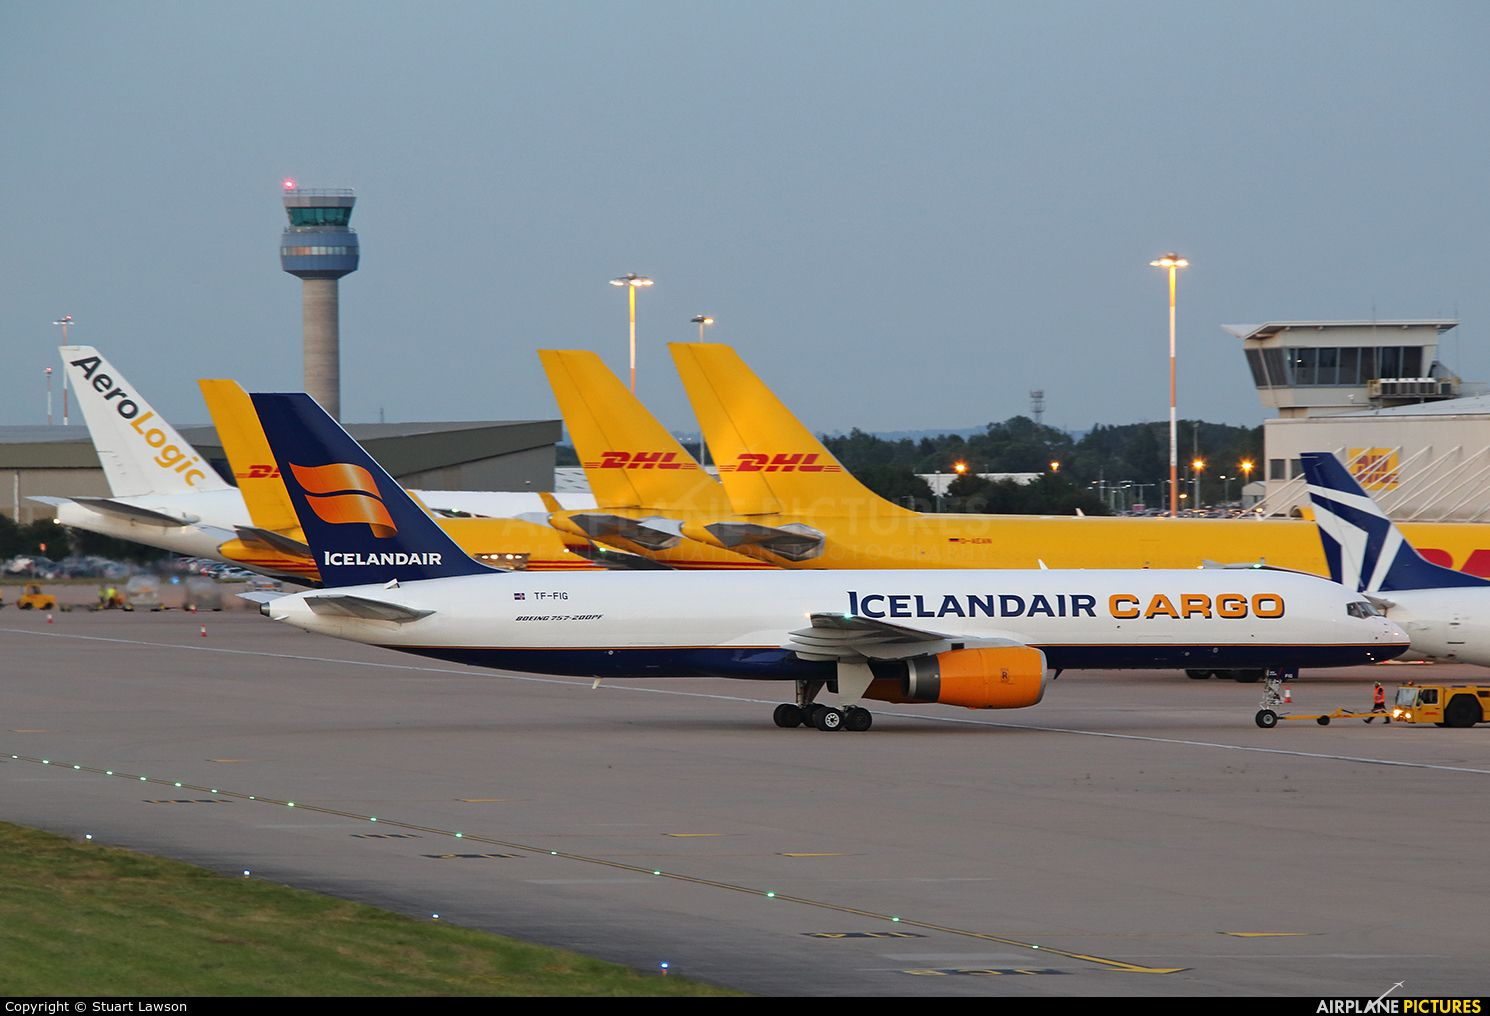 Icelandair Cargo Boeing 757200F photo by Stuart Lawson